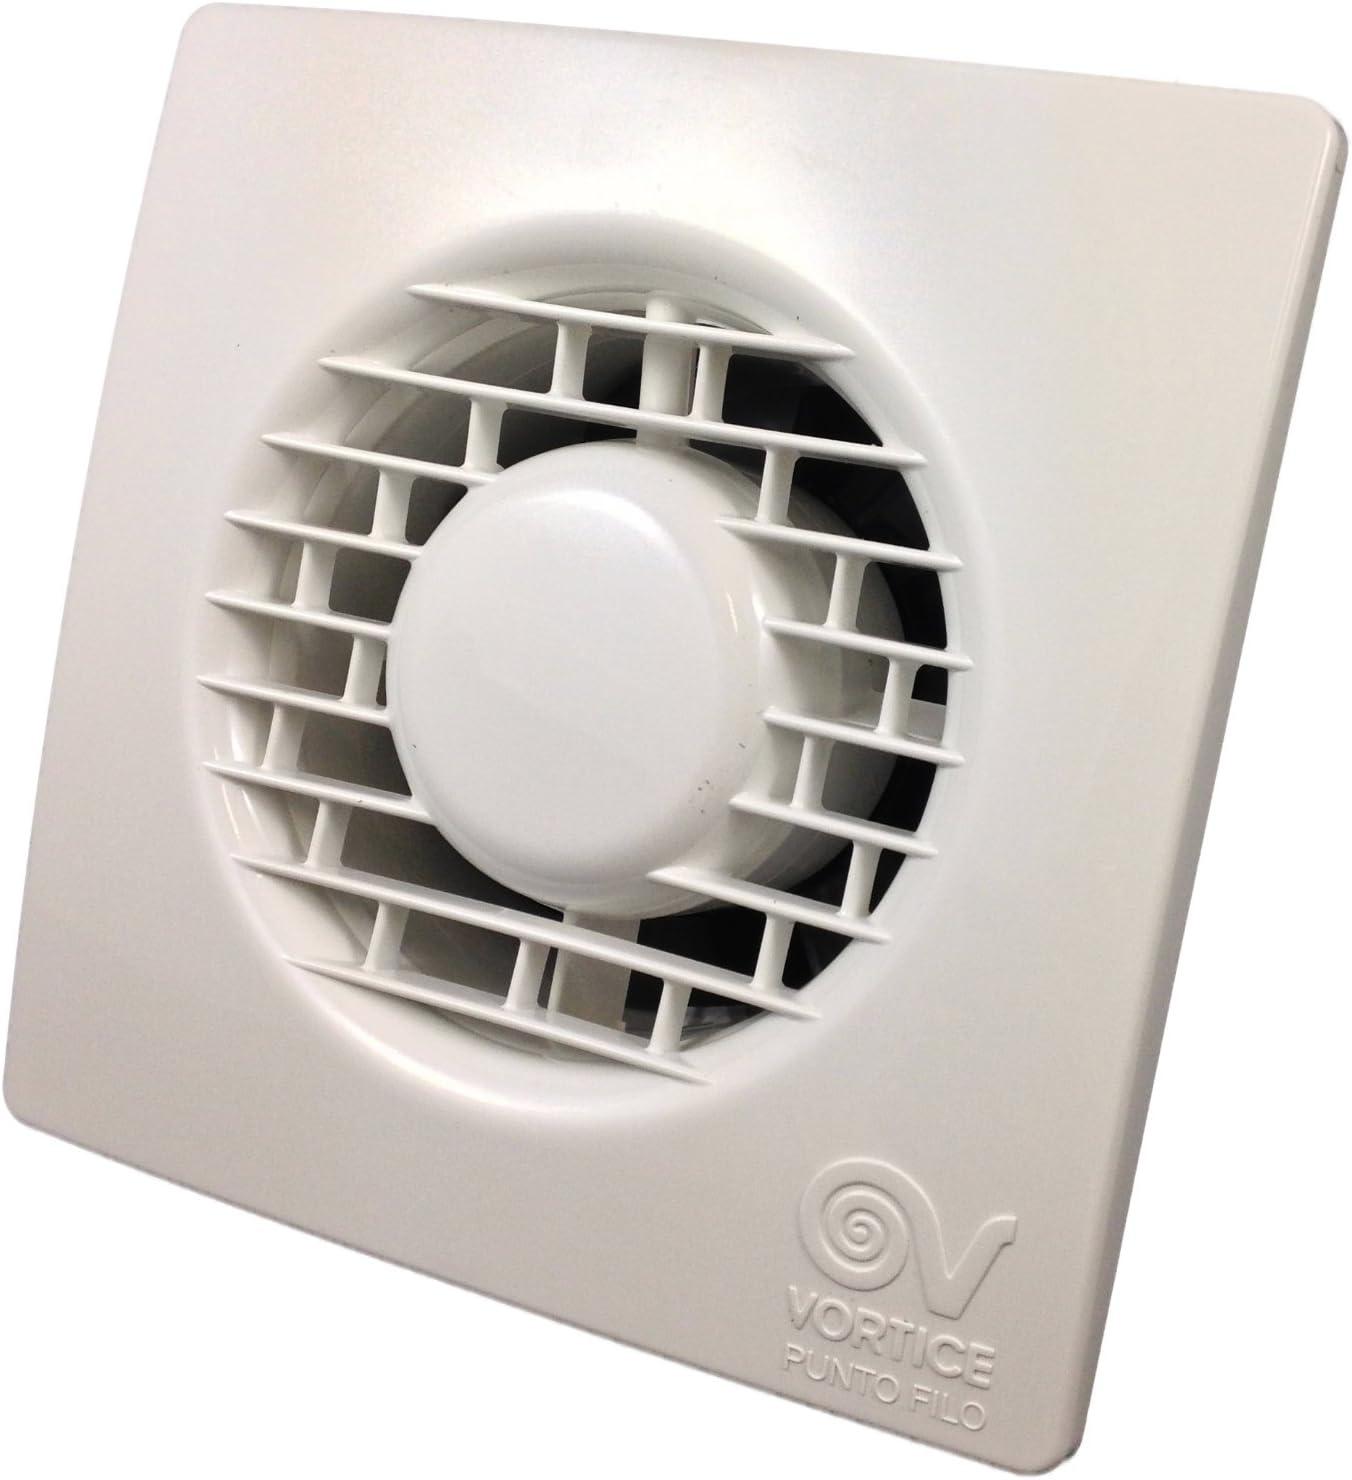 Vortice 20 Toilet / Bathroom Extractor Fan with Timer Punto Filo  MF20/20